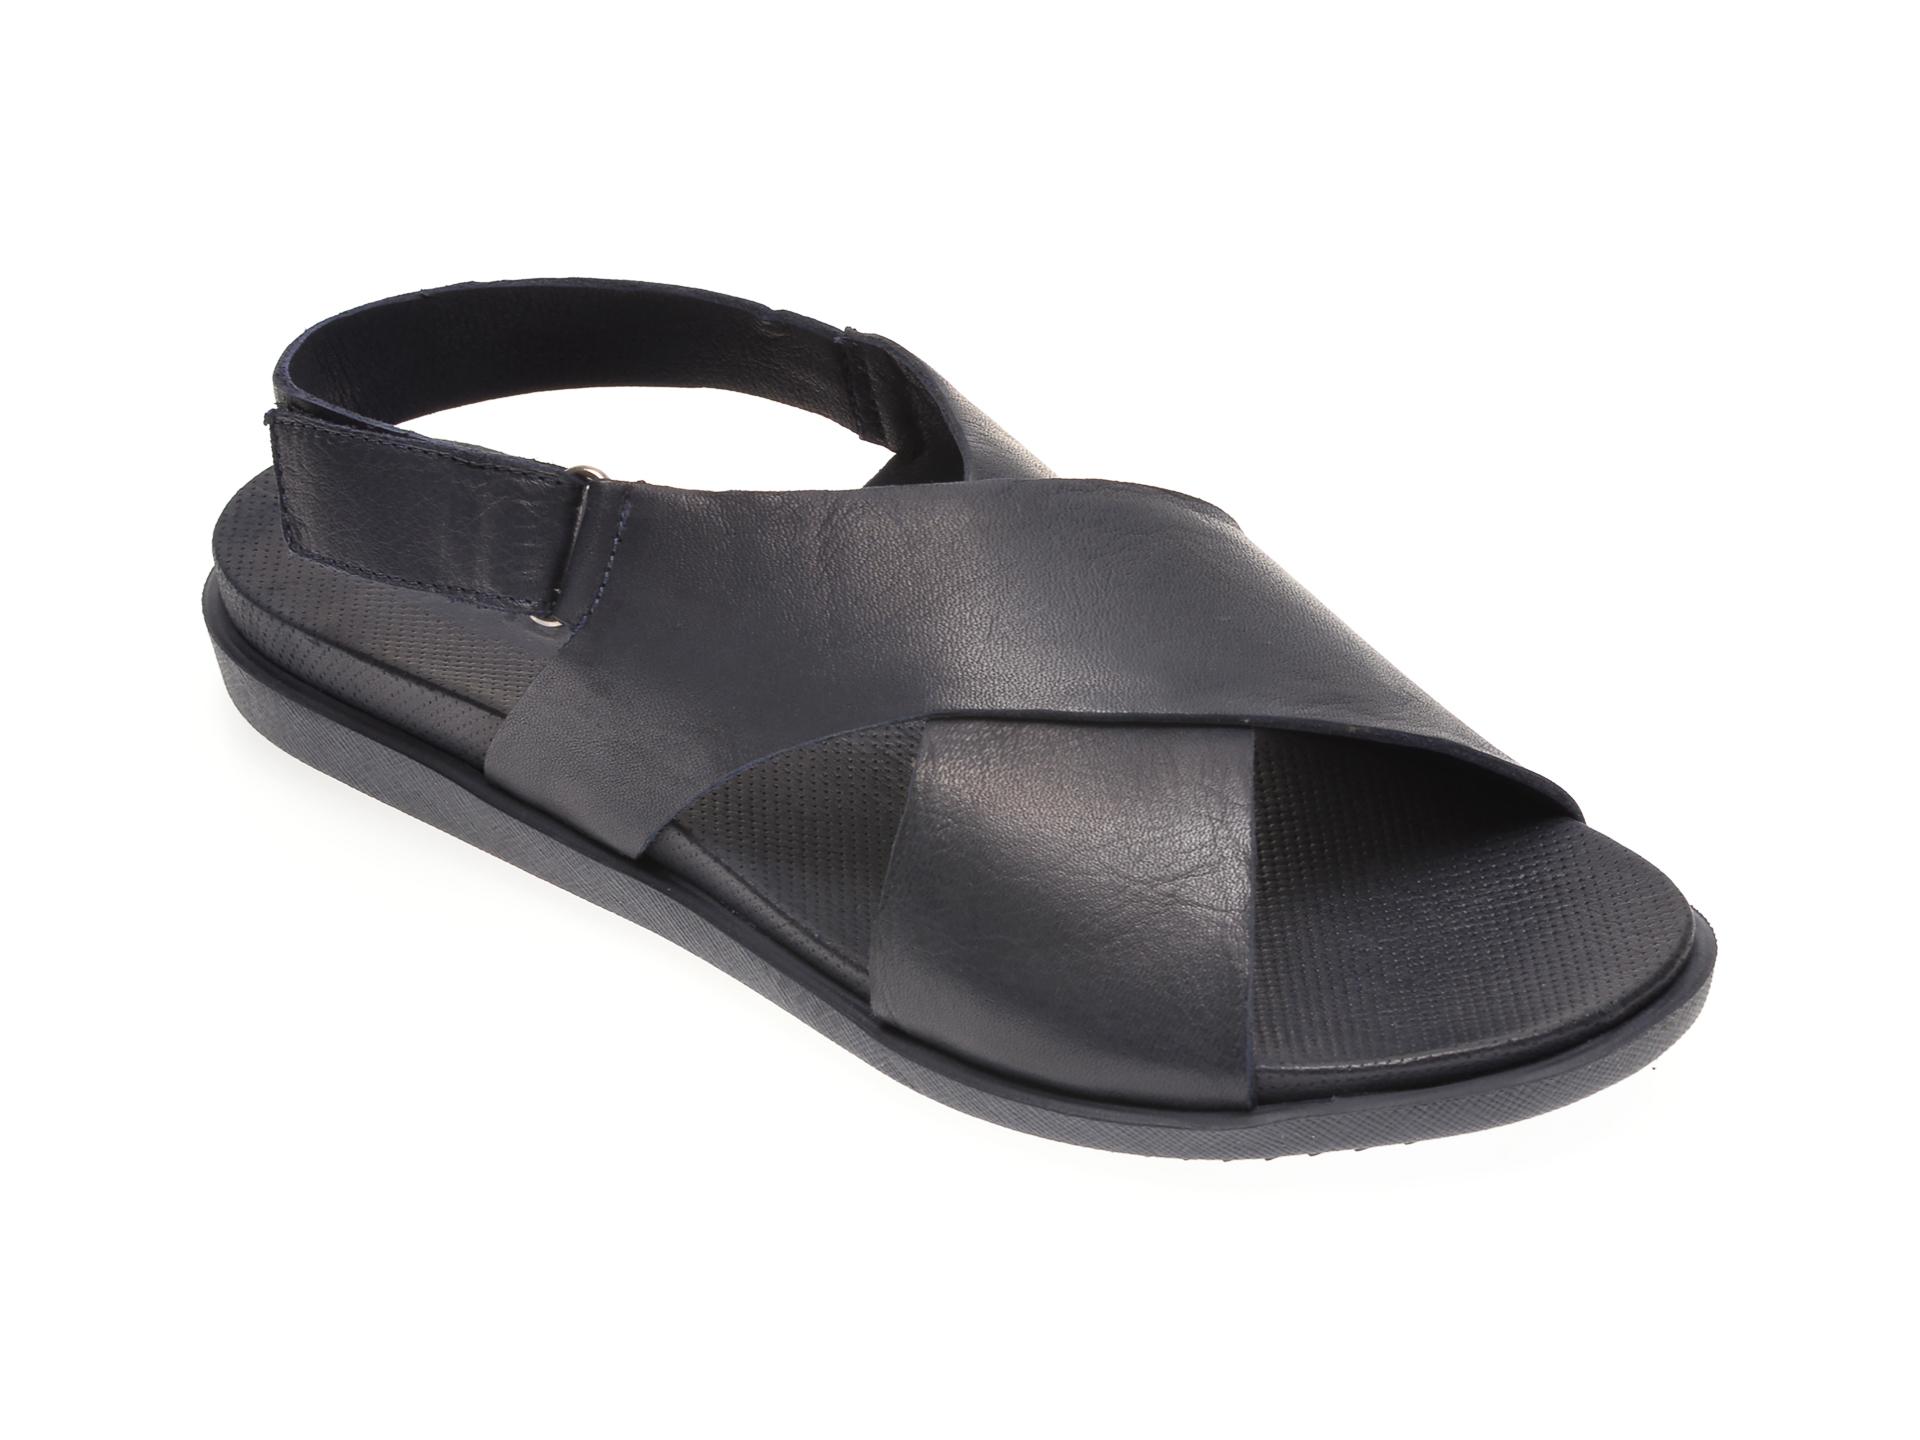 Sandale BABOOS bleumarin, 1401, din piele naturala